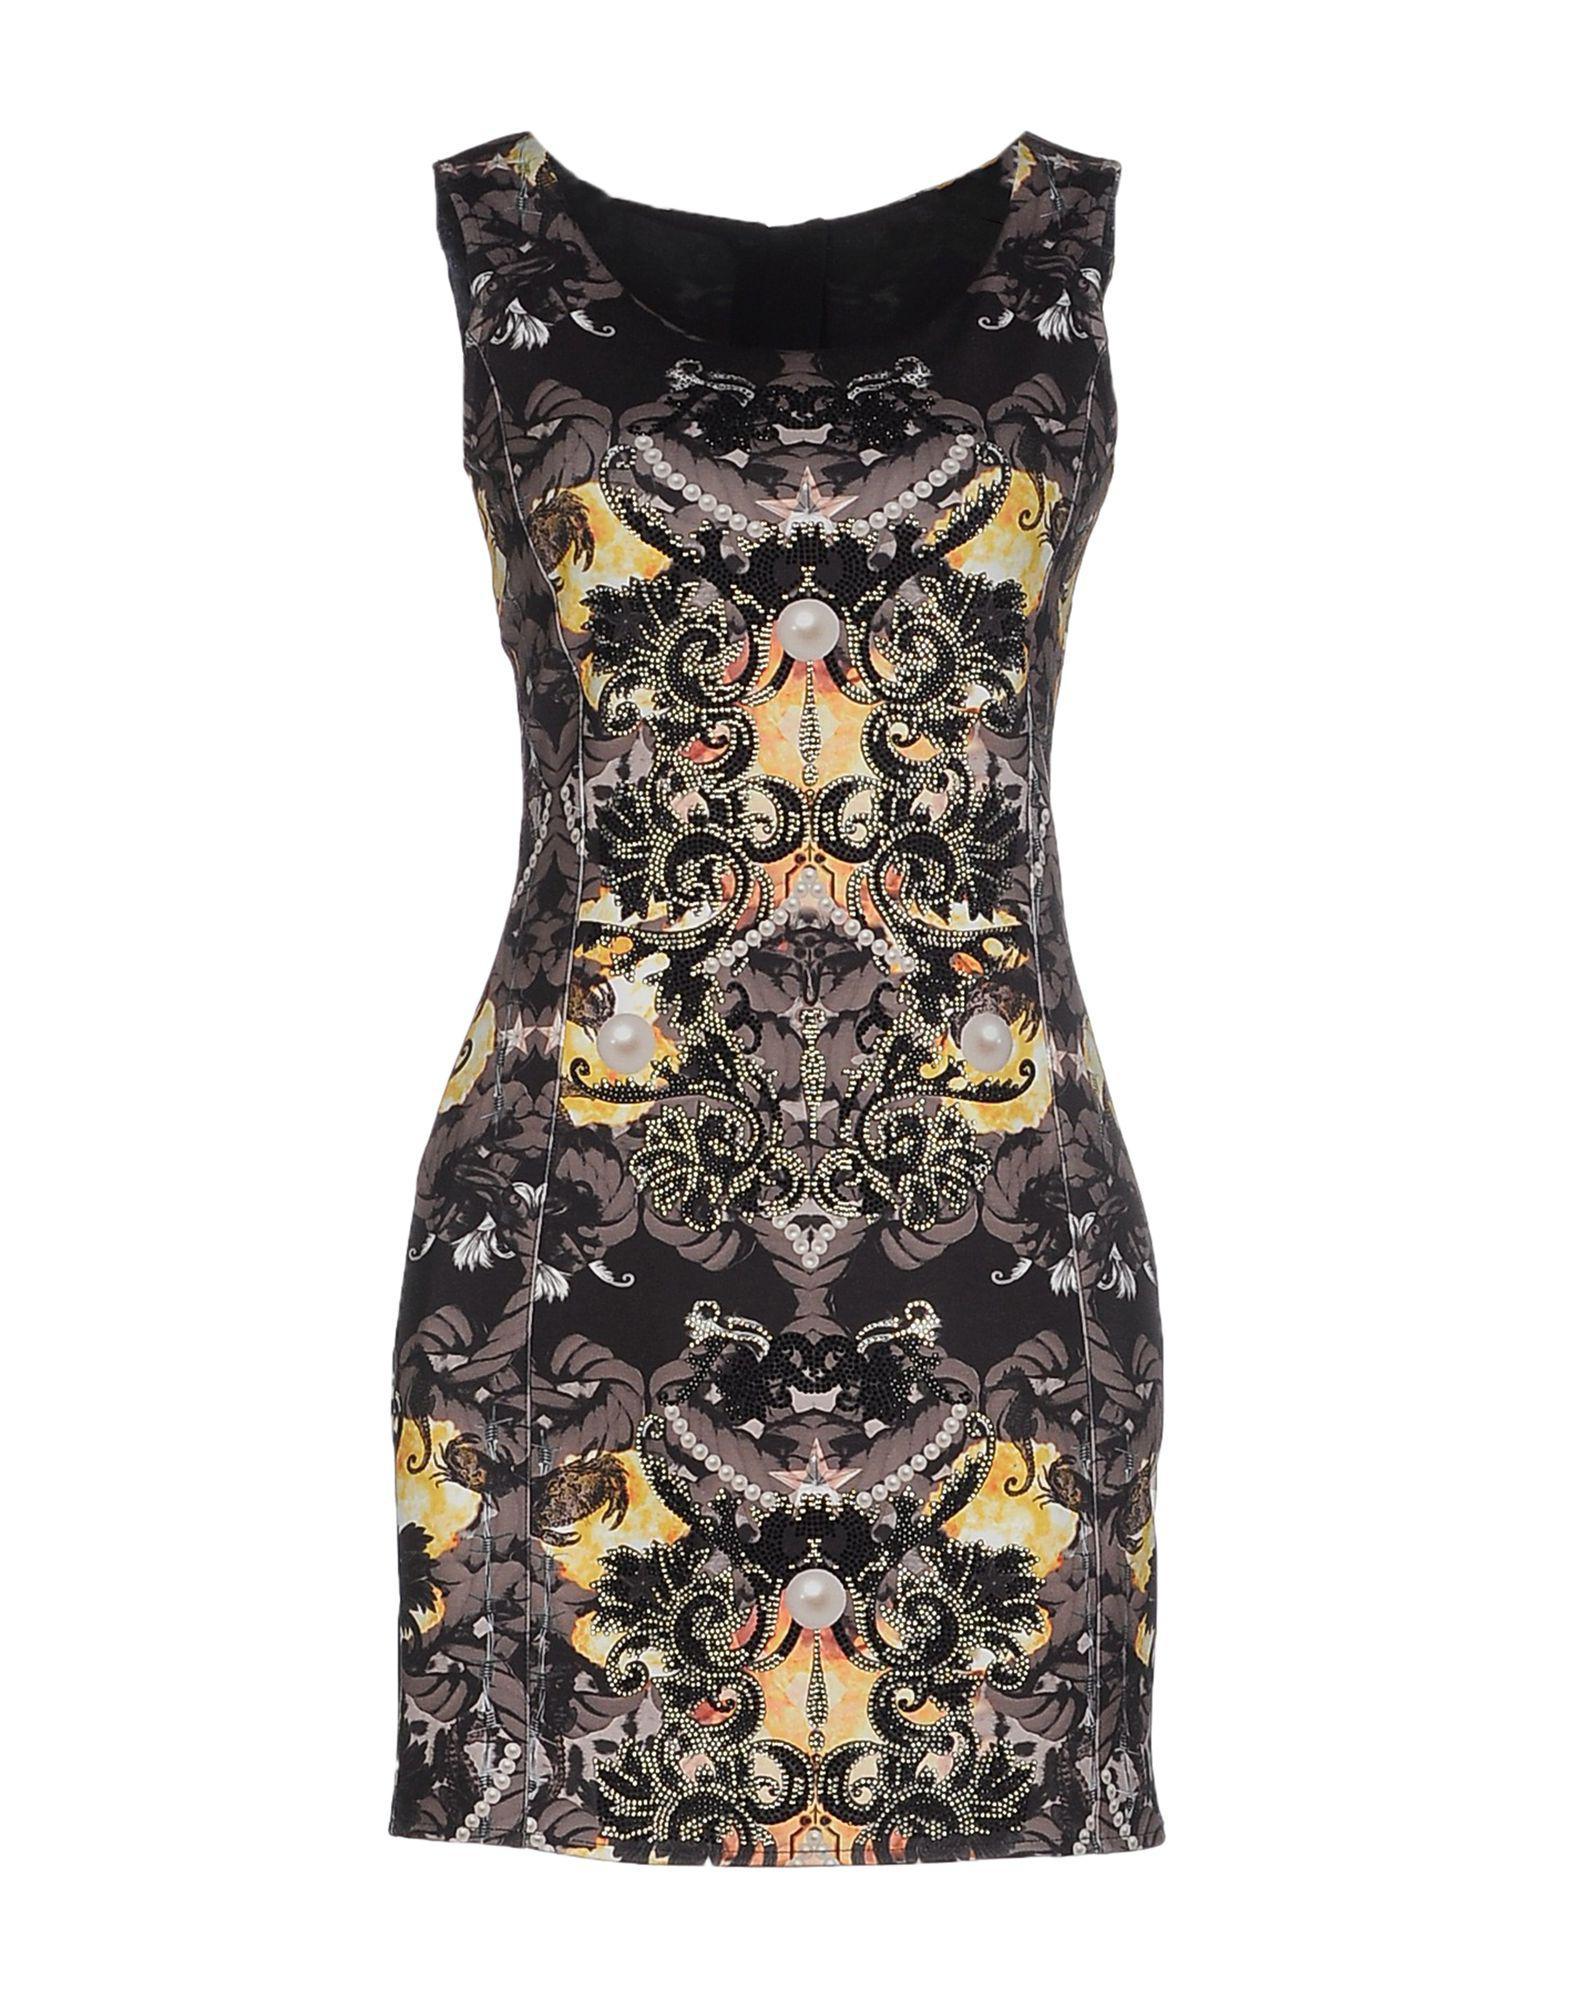 DRESSES - Short dresses Dacute Where To Buy Cheap Real Cheap Sale Wiki Drop Shipping RcWC0euABU